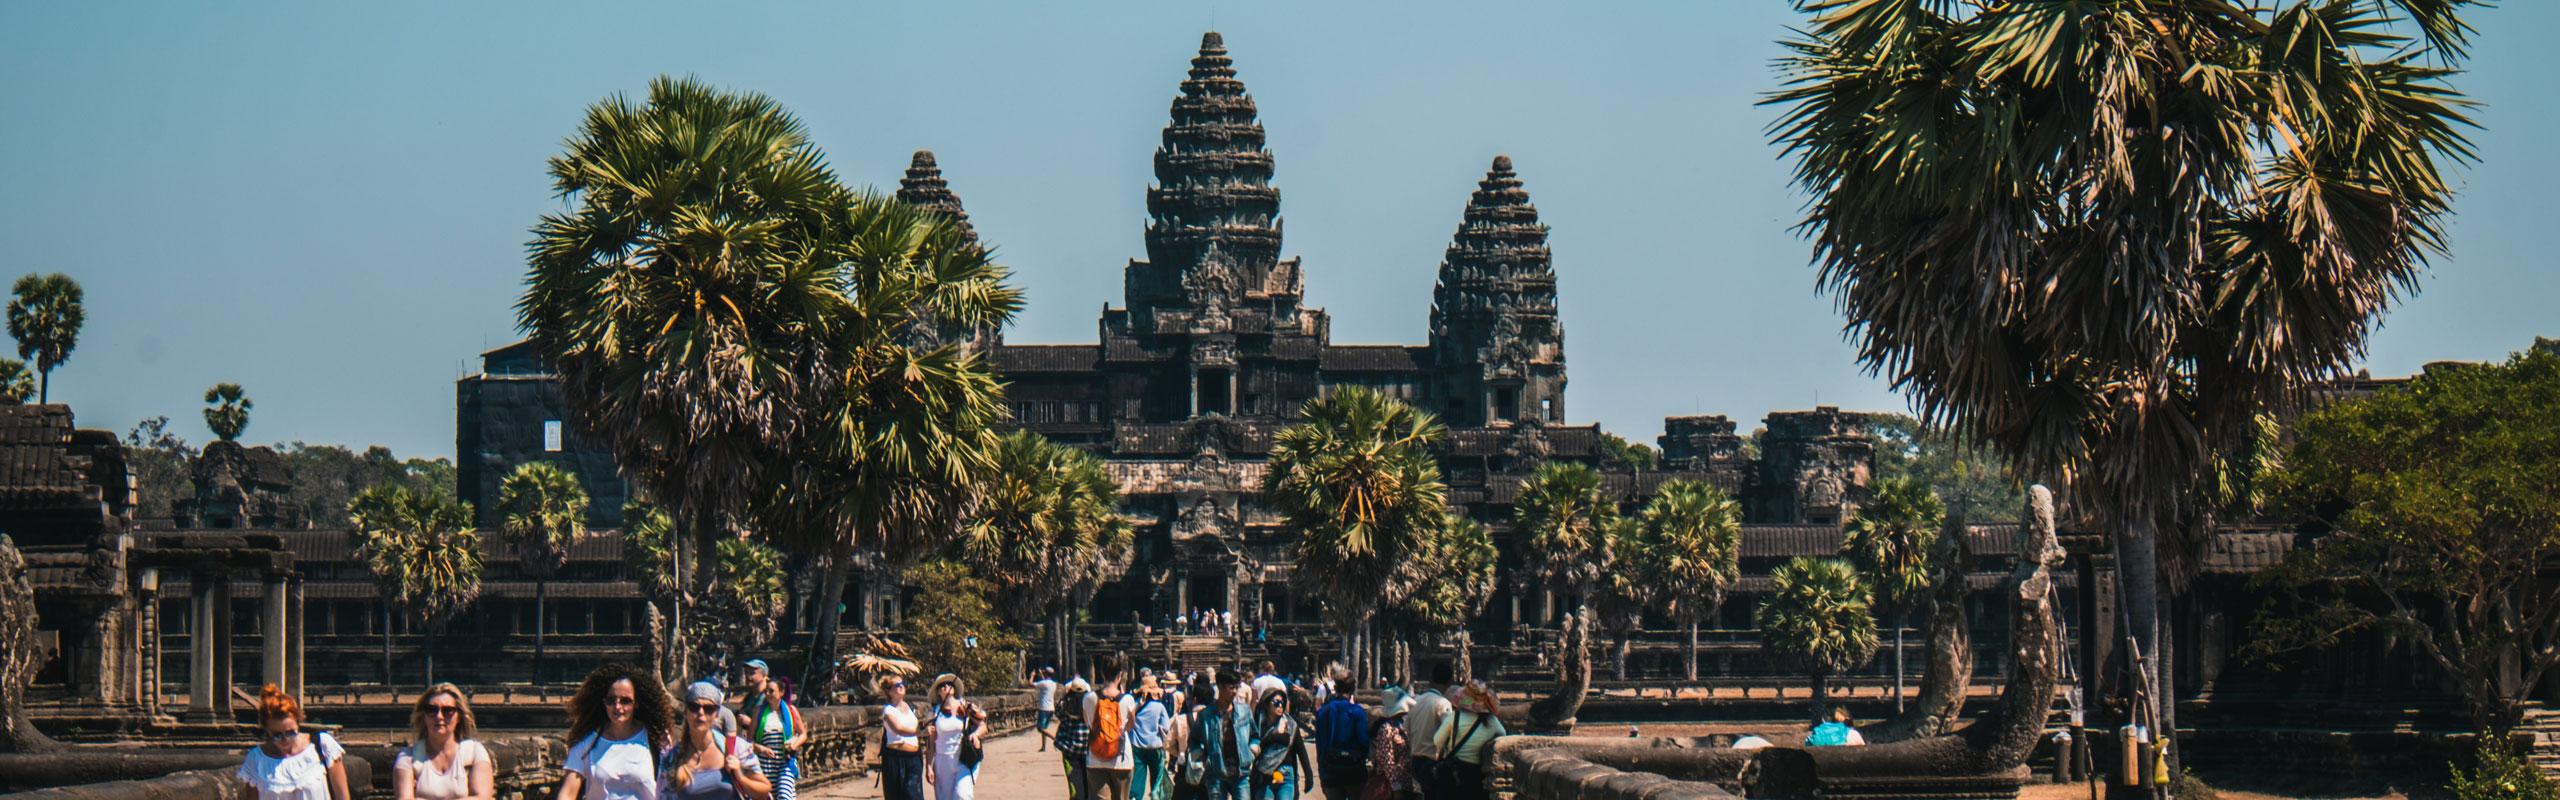 15-DayIndochina Highlights: Cambodia, Vietnam and Laos Tour